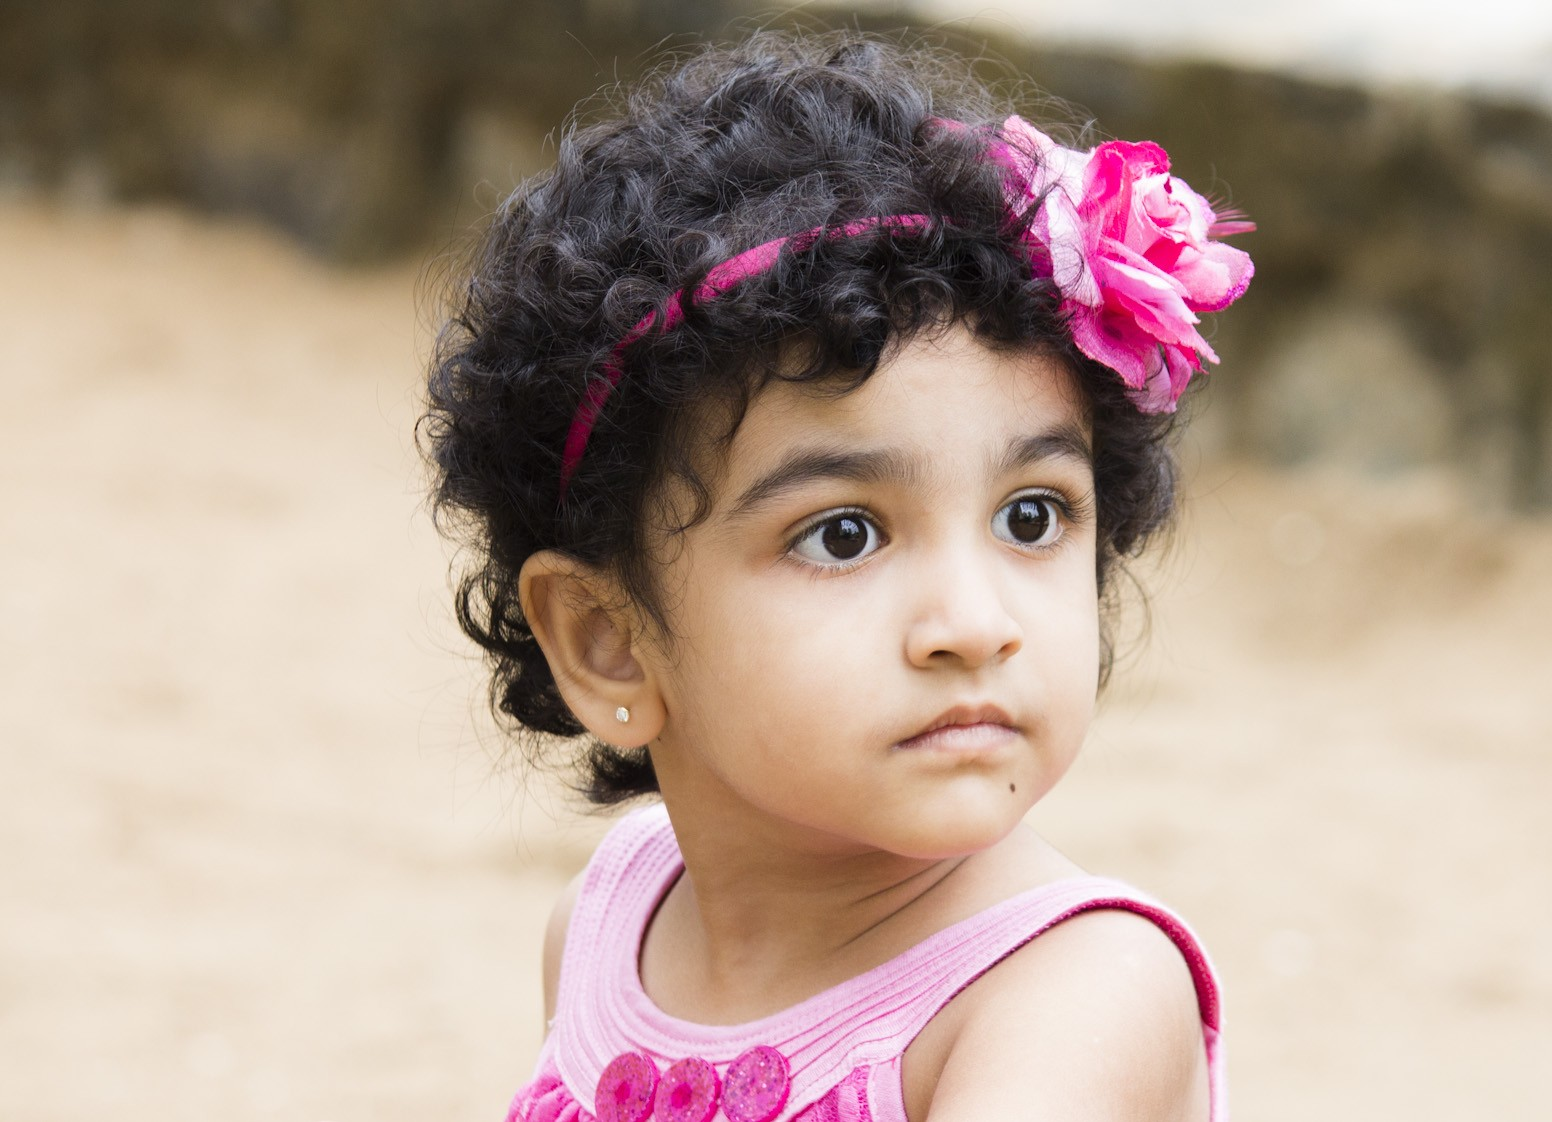 Saanchi Tawde